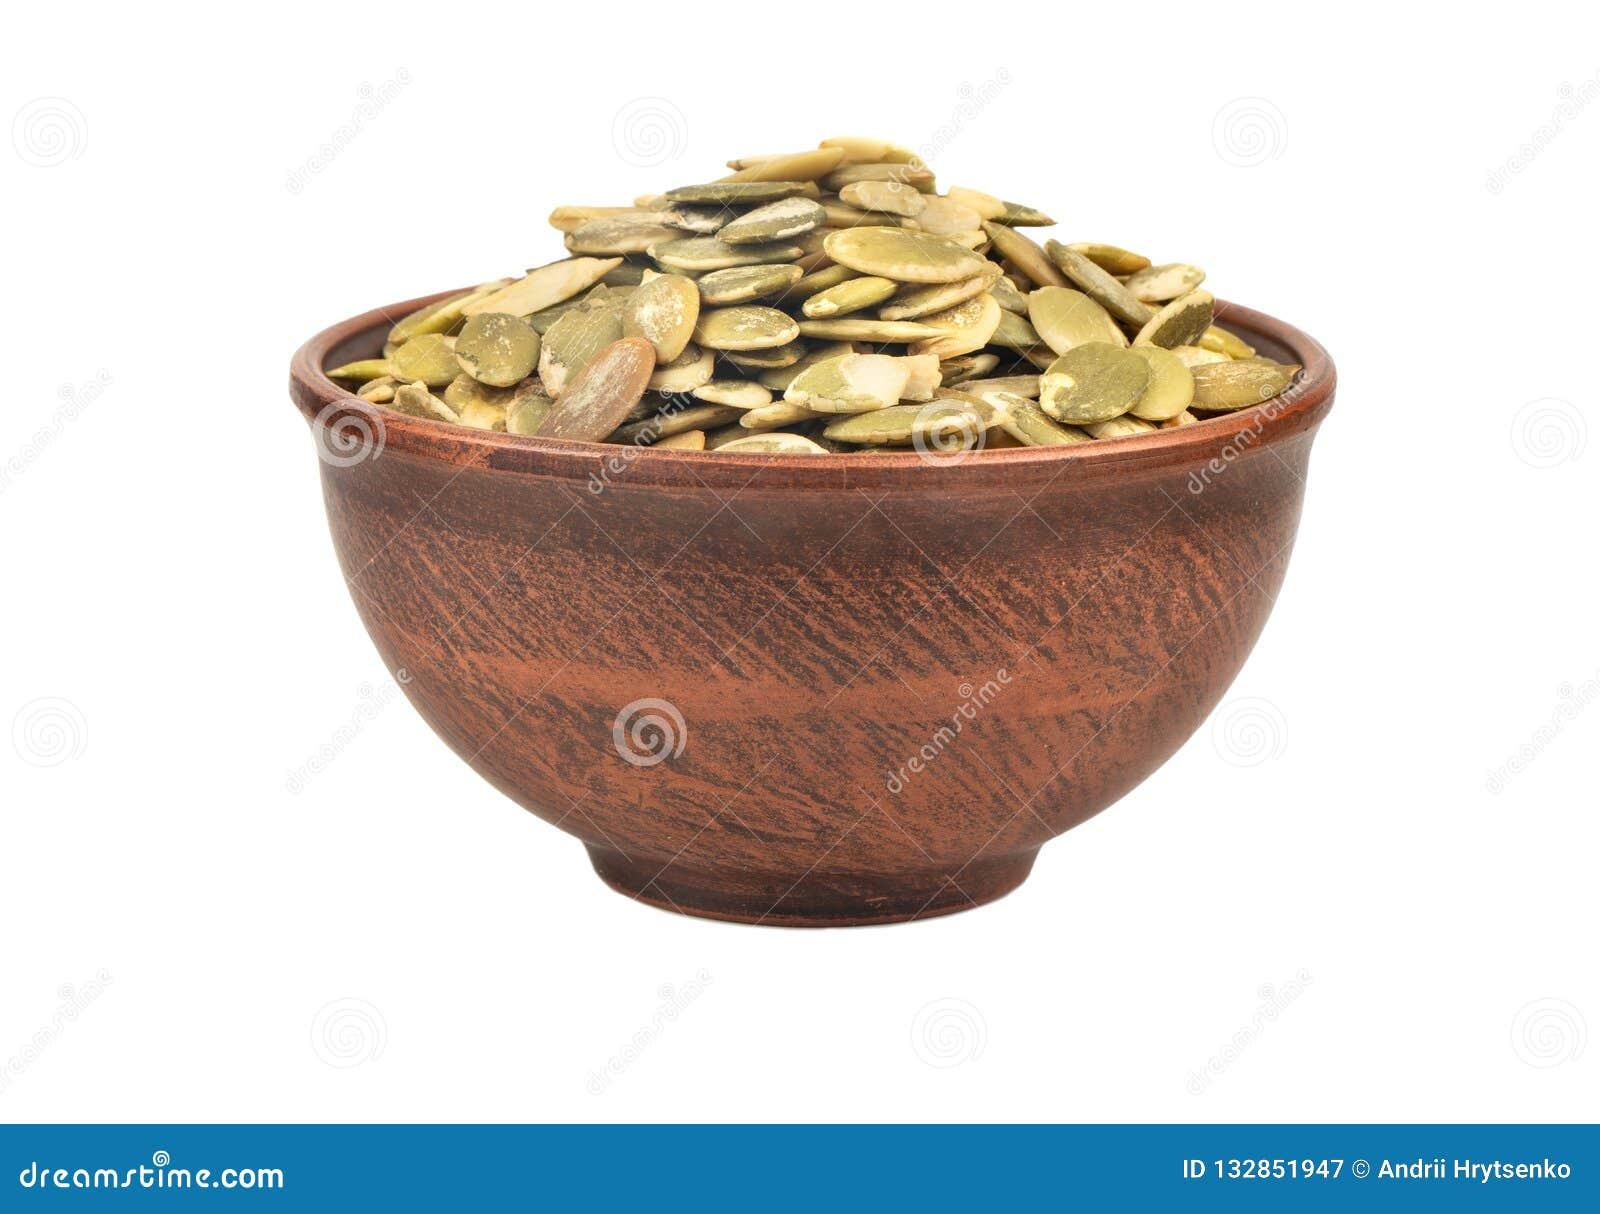 Pumpkin seed kernels in bowl